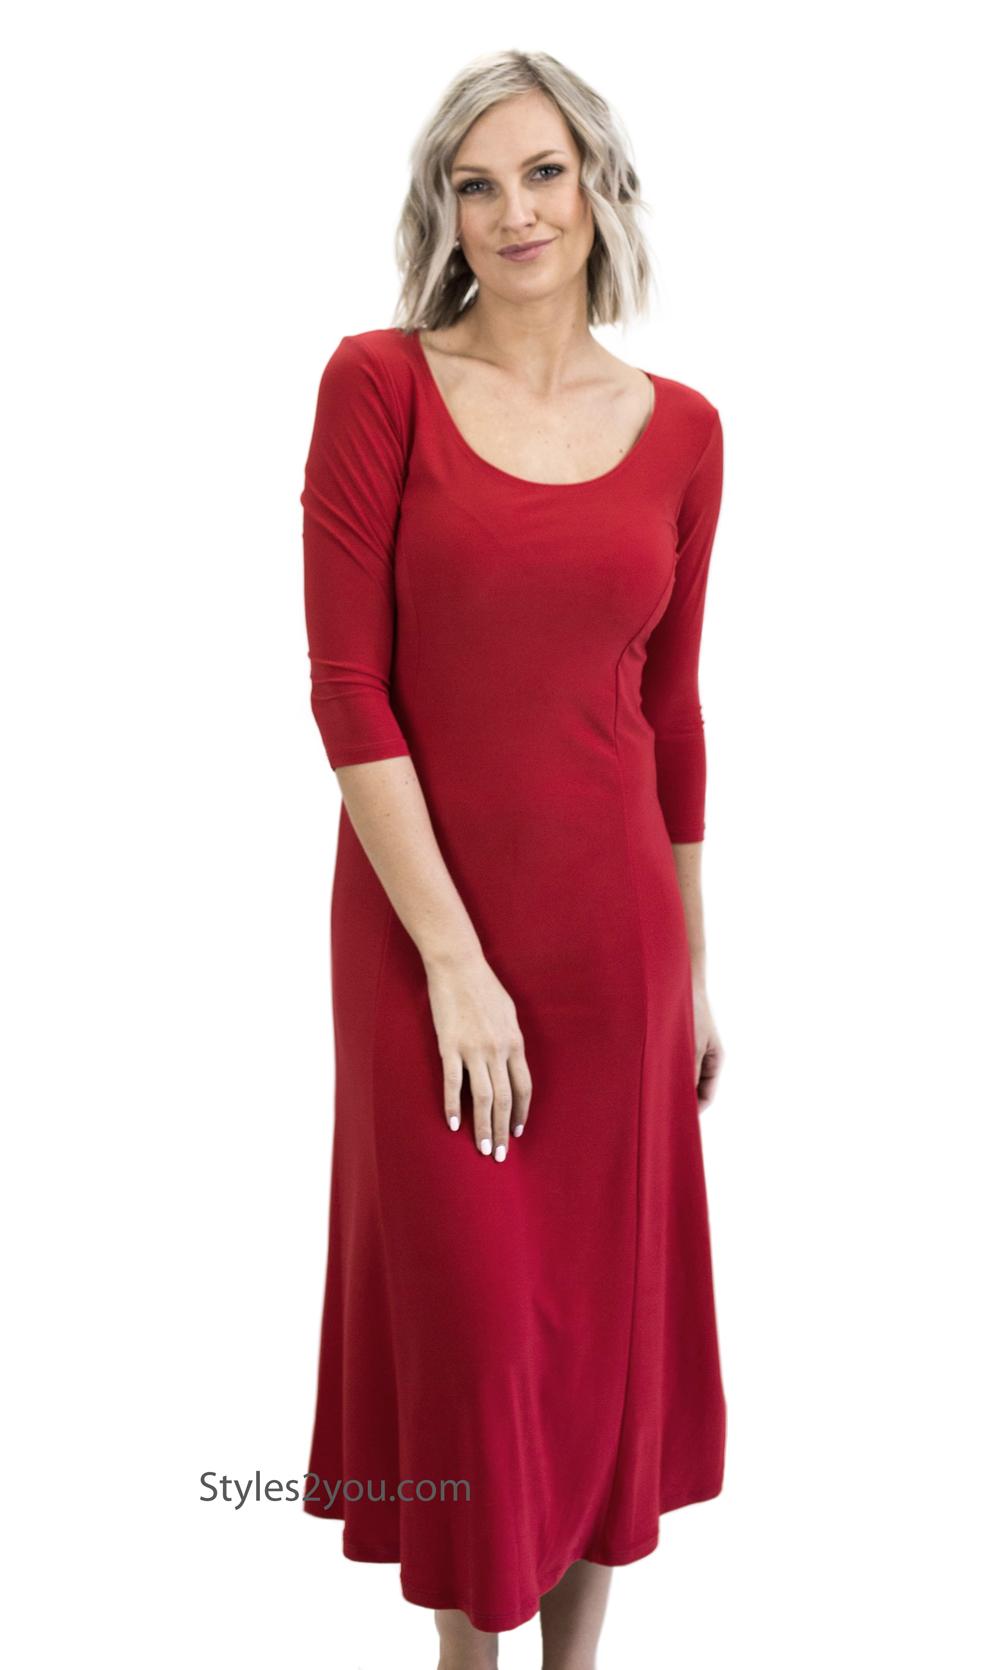 Annabelle Vintage Dye-Red Side Pockets 3//4 Sleeve Scoop Neck Swing Dress